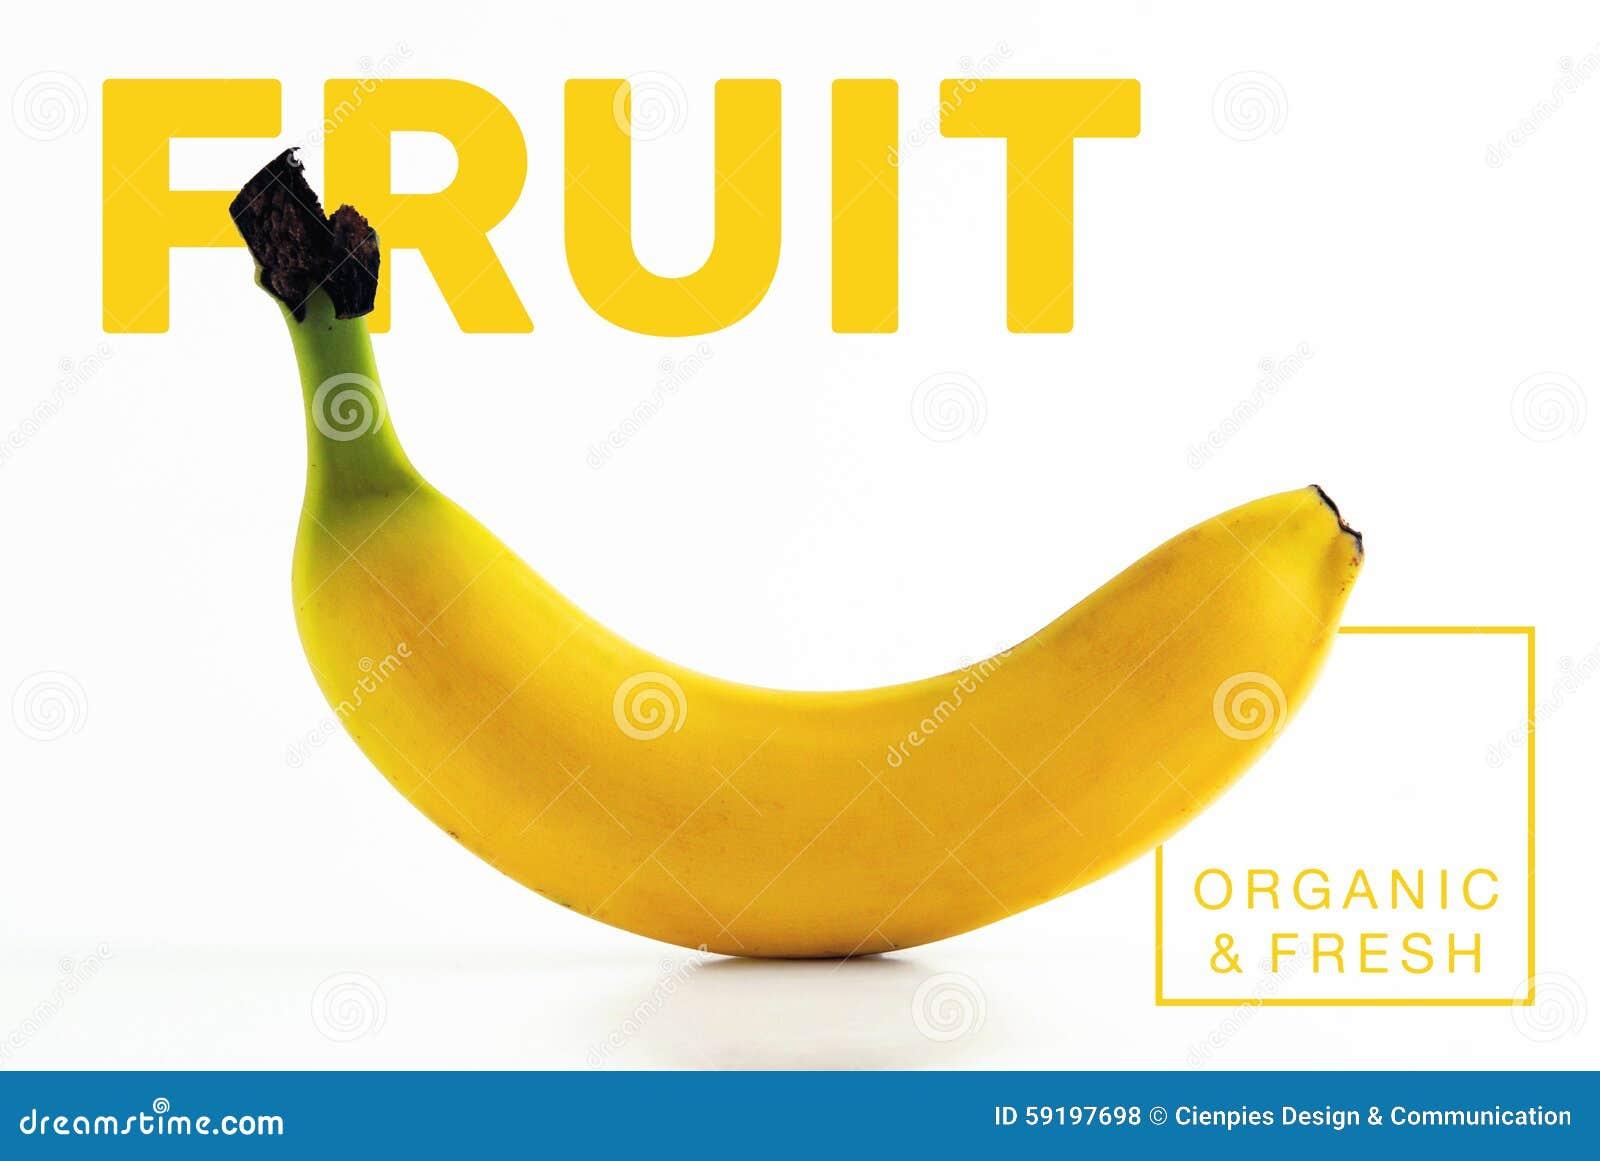 banana fruit organic and fresh food poster stock illustration